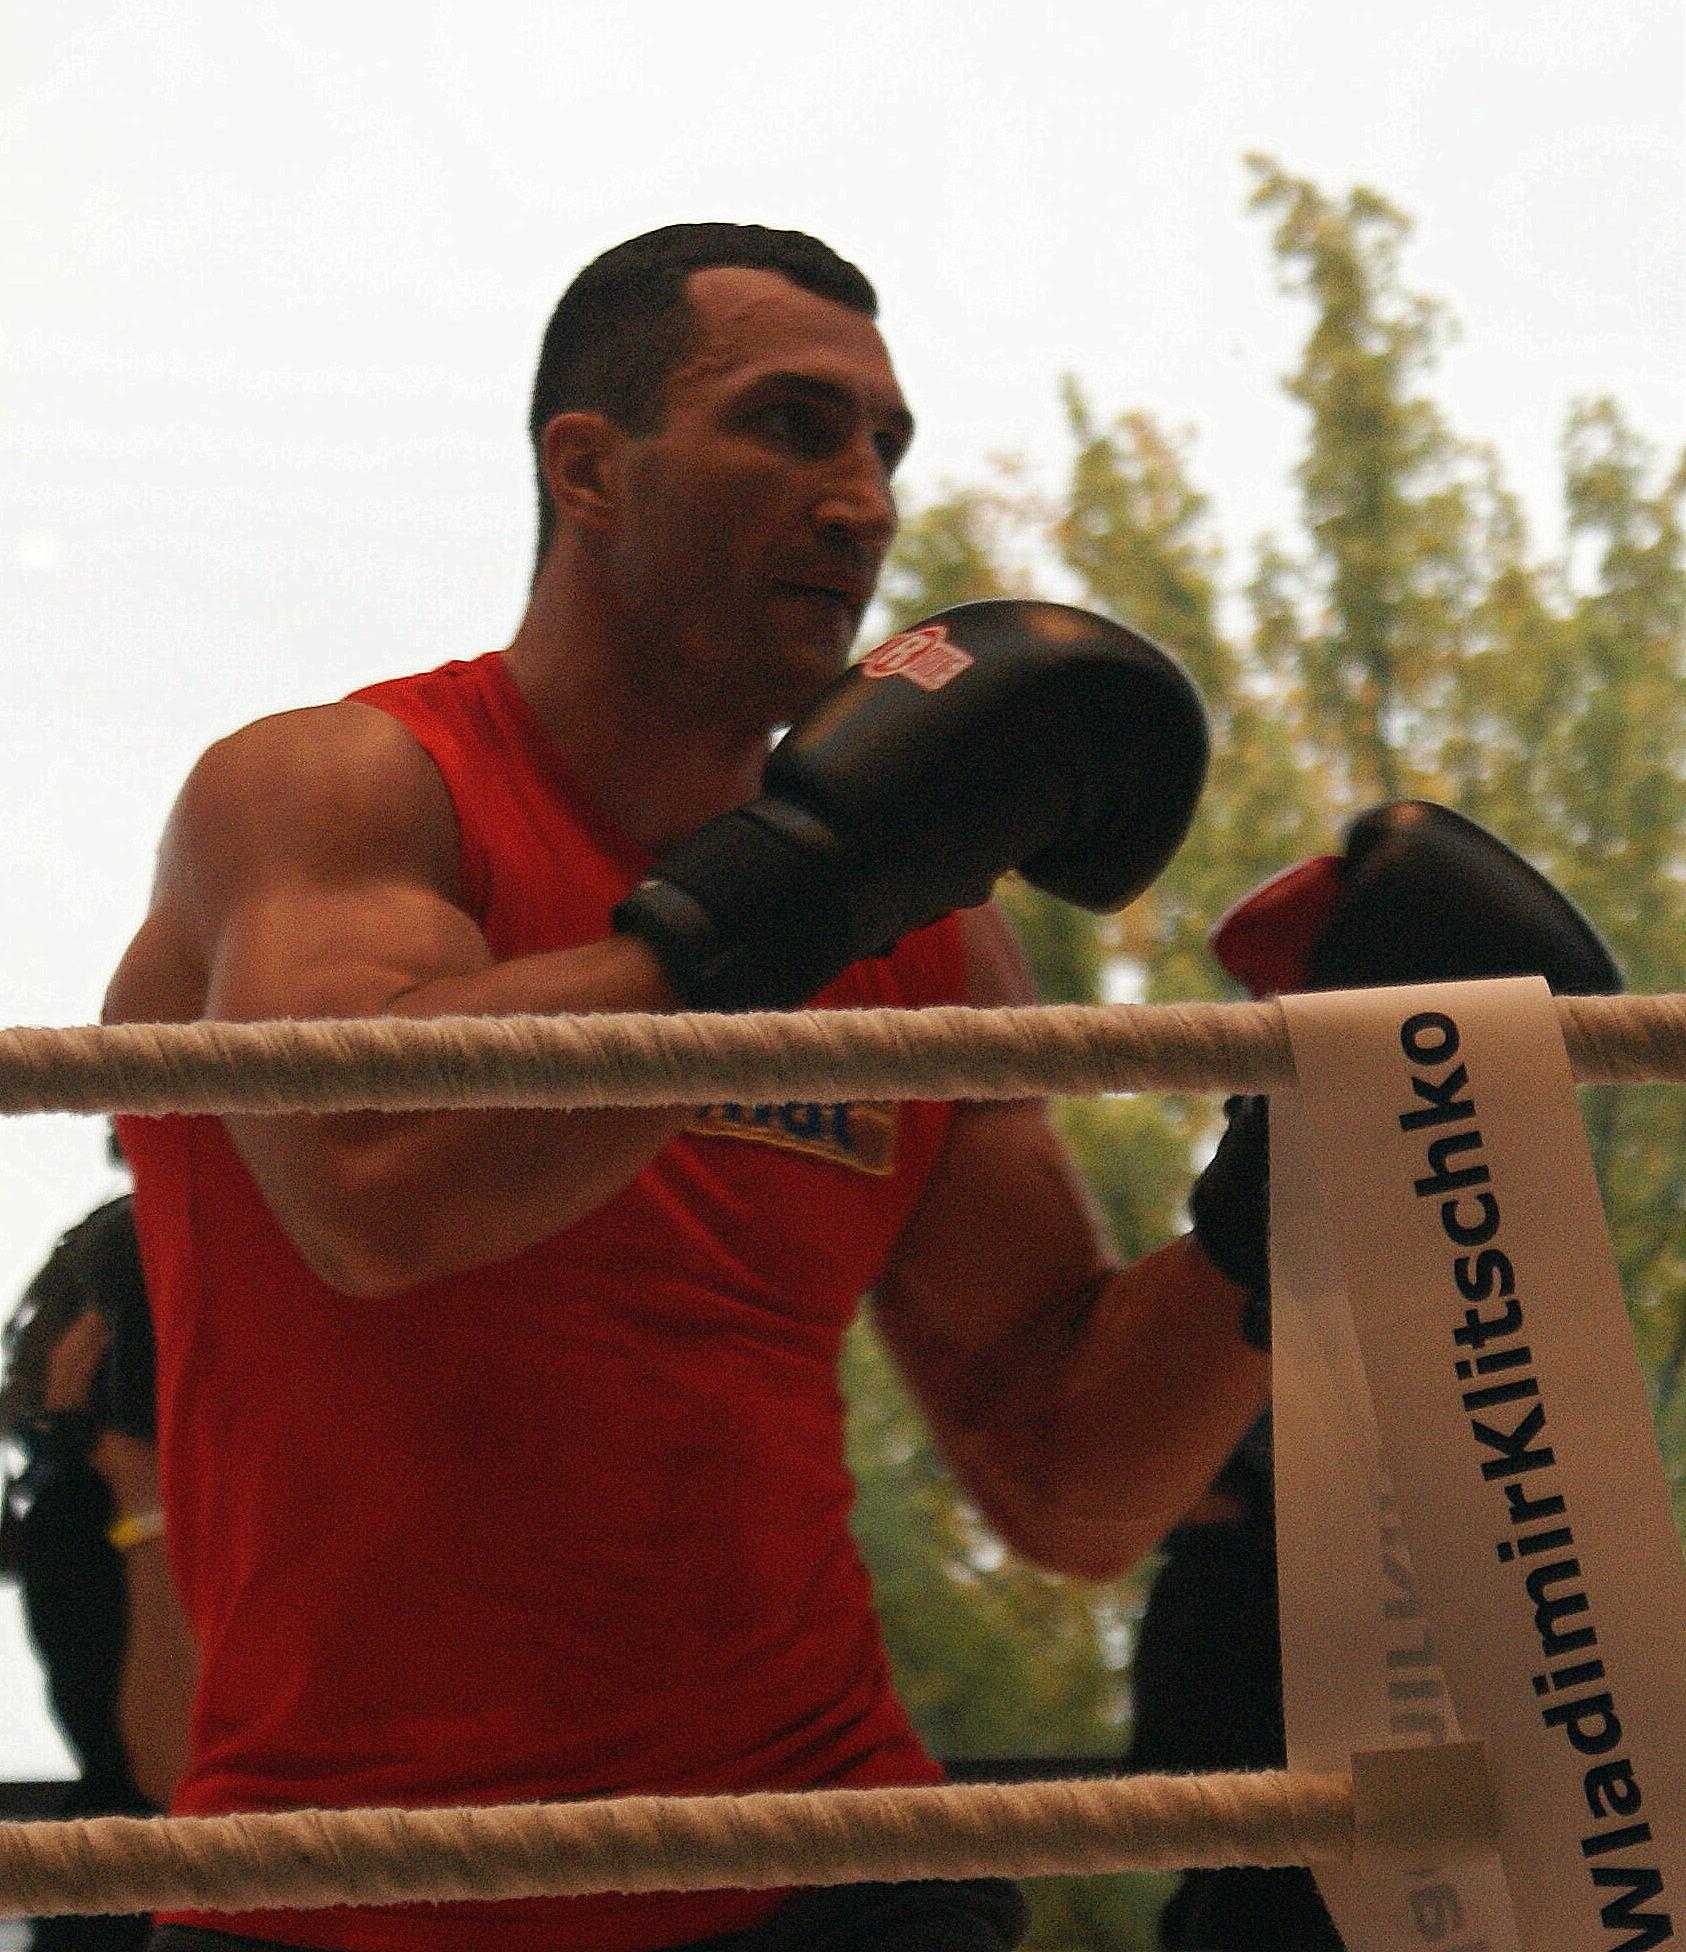 klitschko boxkampf heute